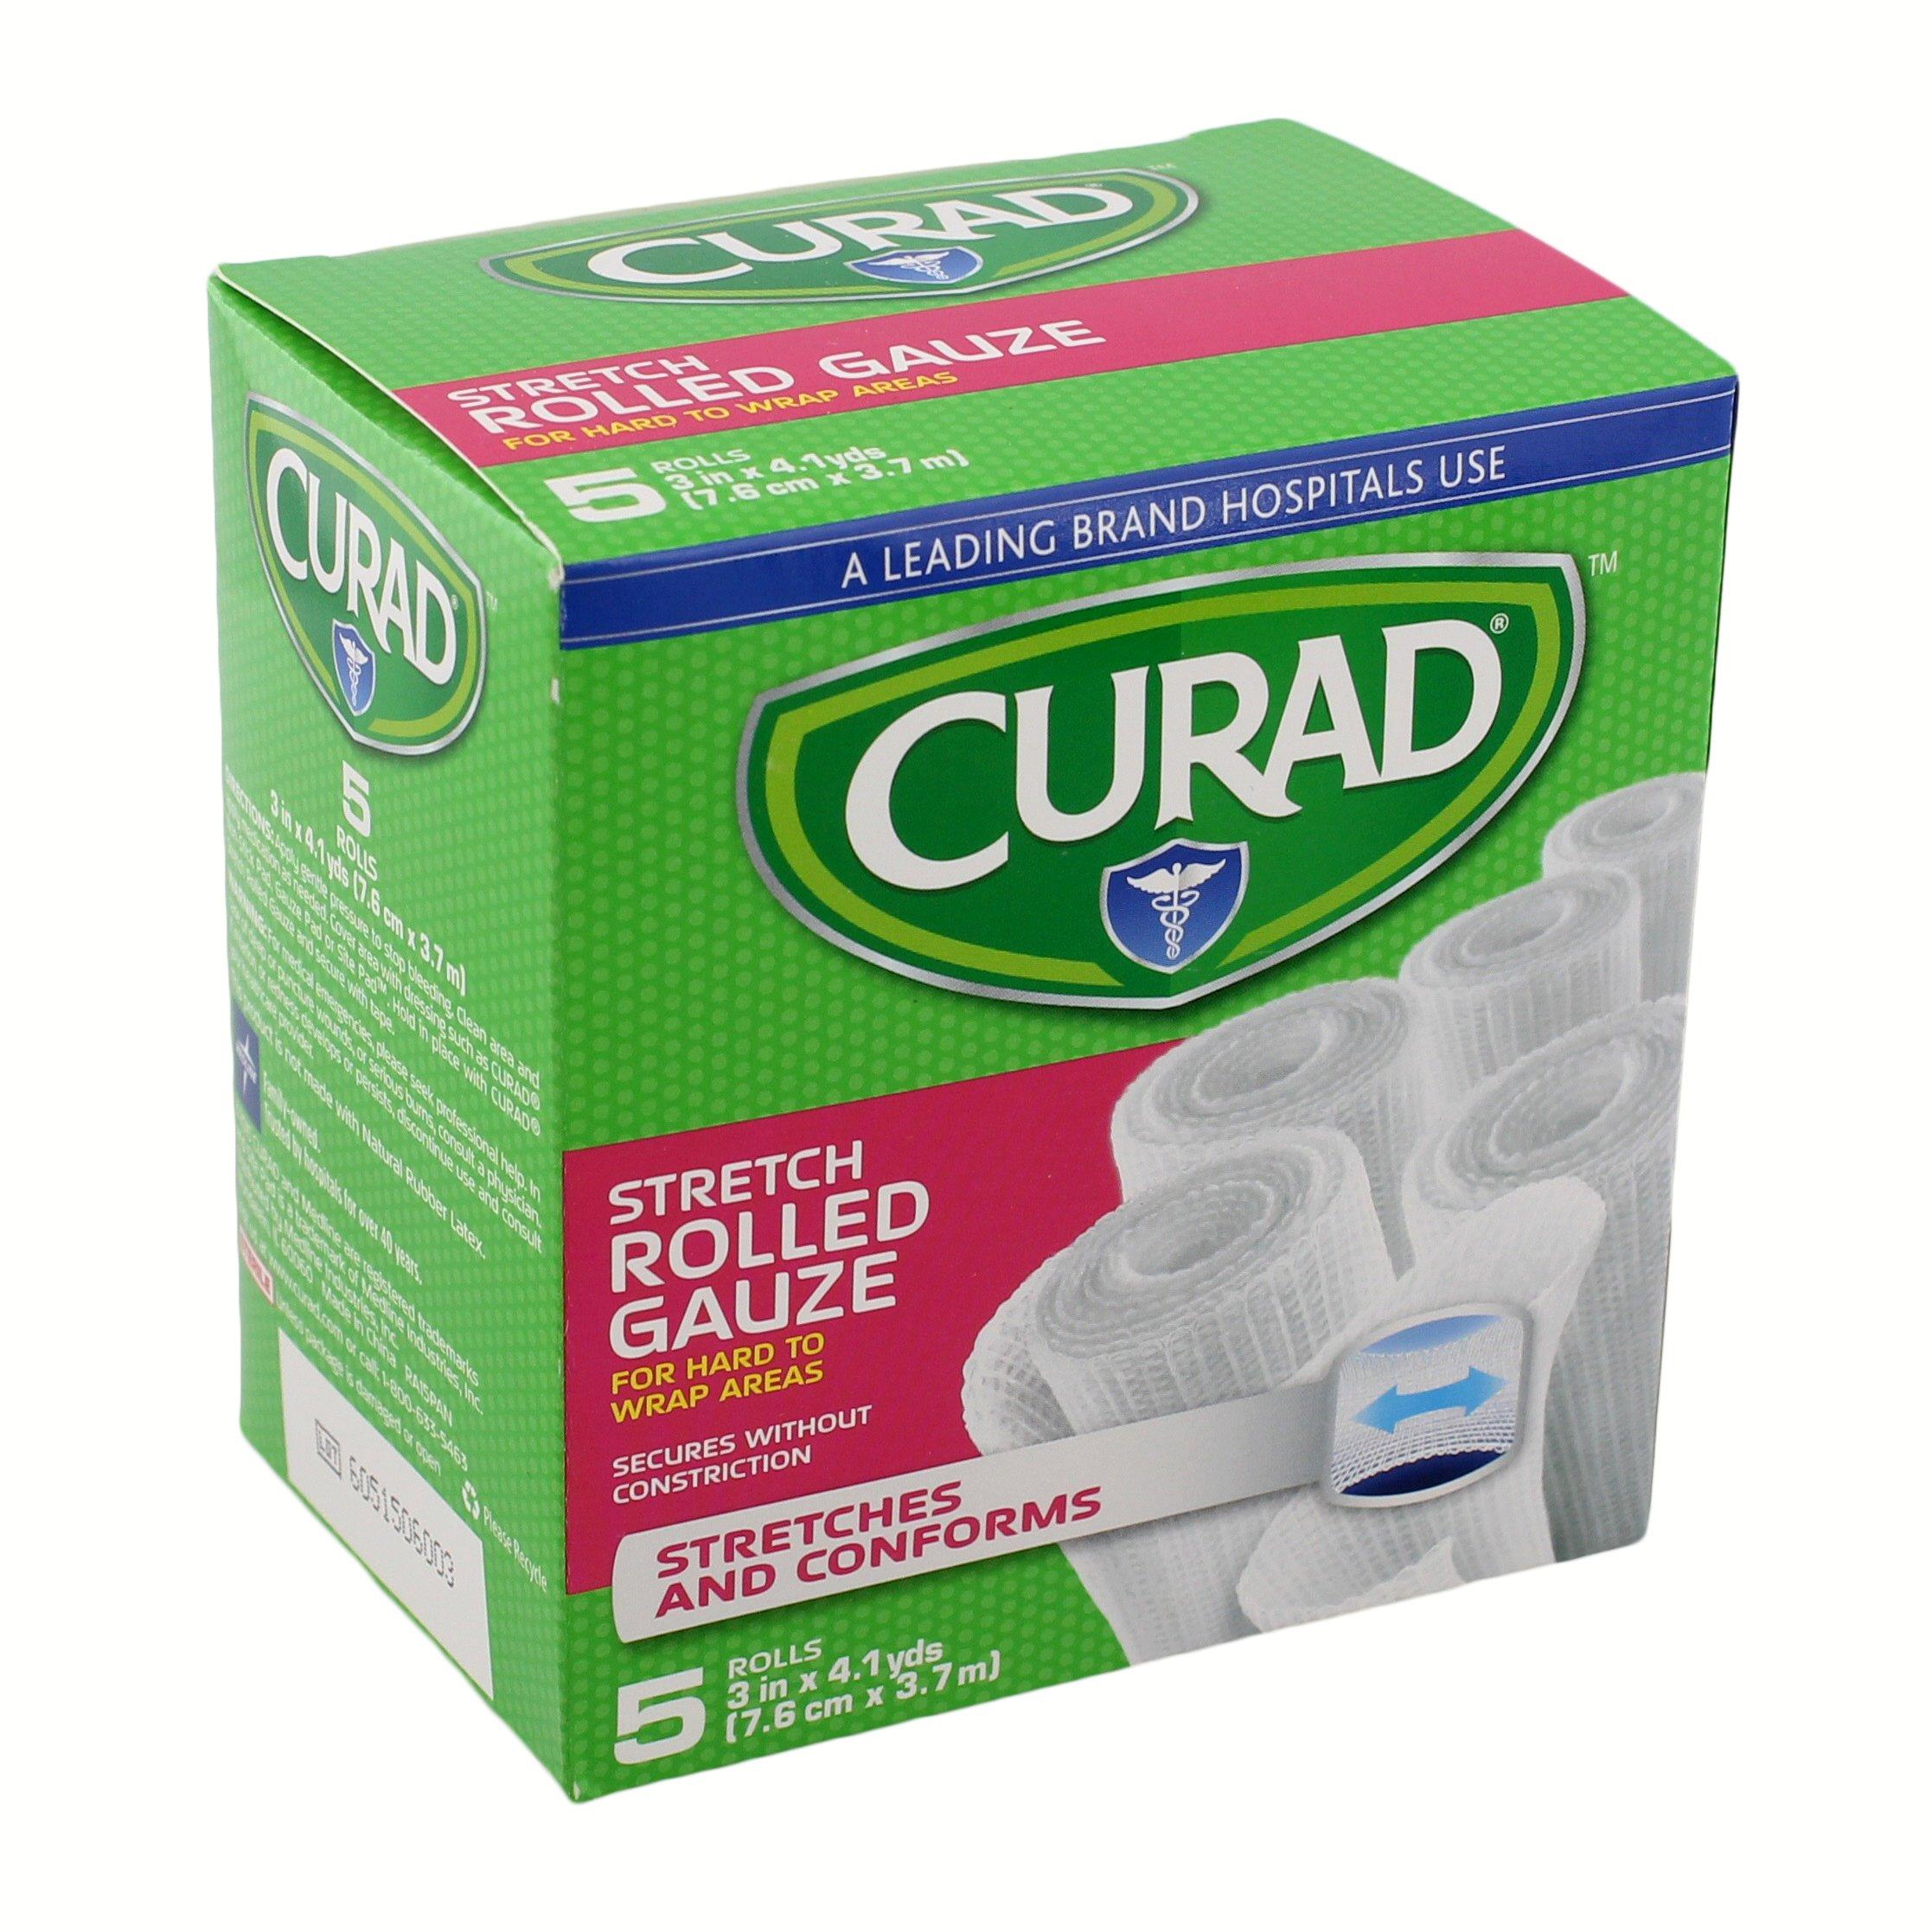 Curad Stretch Rolled Gauze Shop Bandages Gauze At H E B